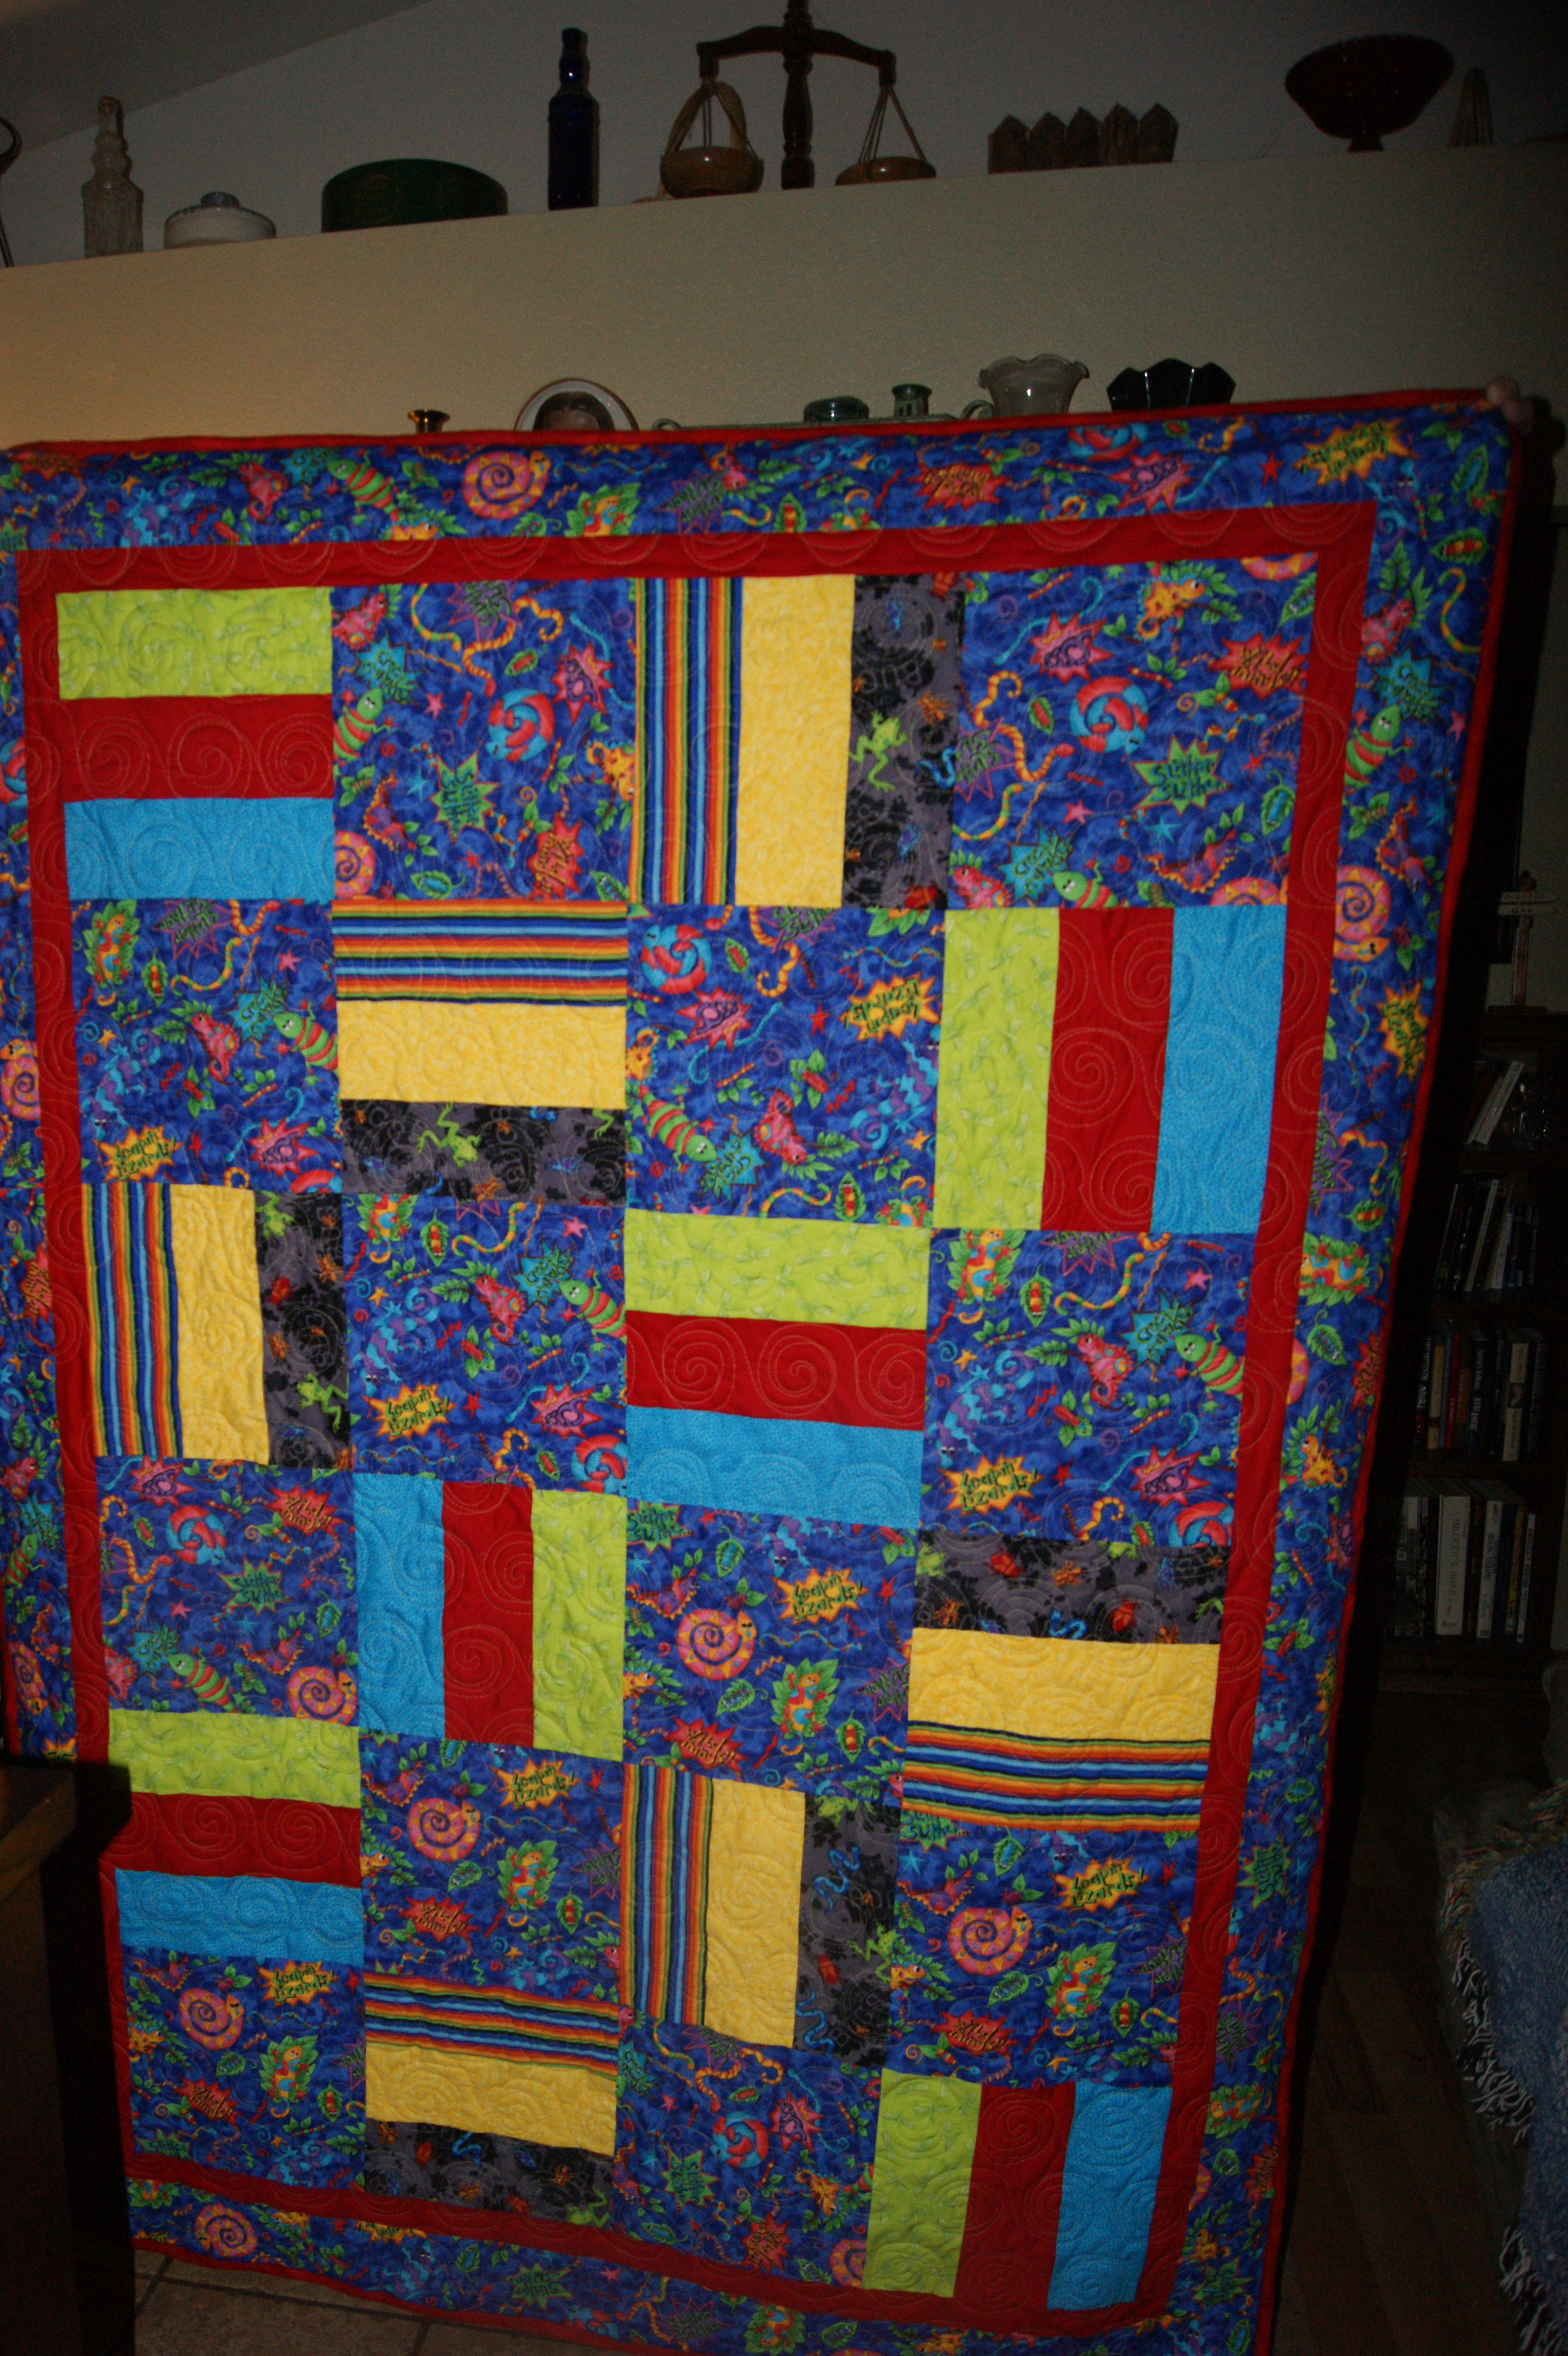 Bug Quilt for Preston | Quilts | Pinterest | Preston : bug quilt - Adamdwight.com